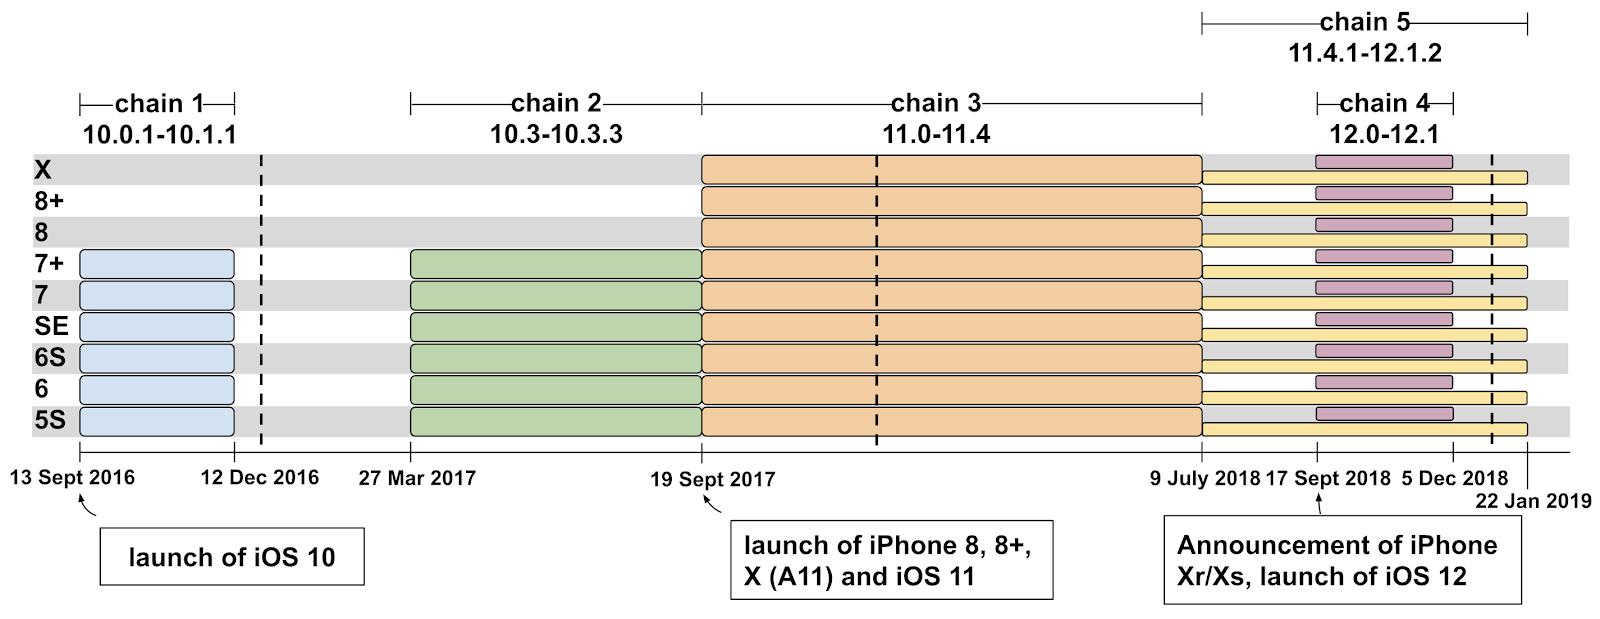 iOS Exploit Chain  - i - iOS Exploit Chain Found Via Hacked Websites to Hack Your iPhone